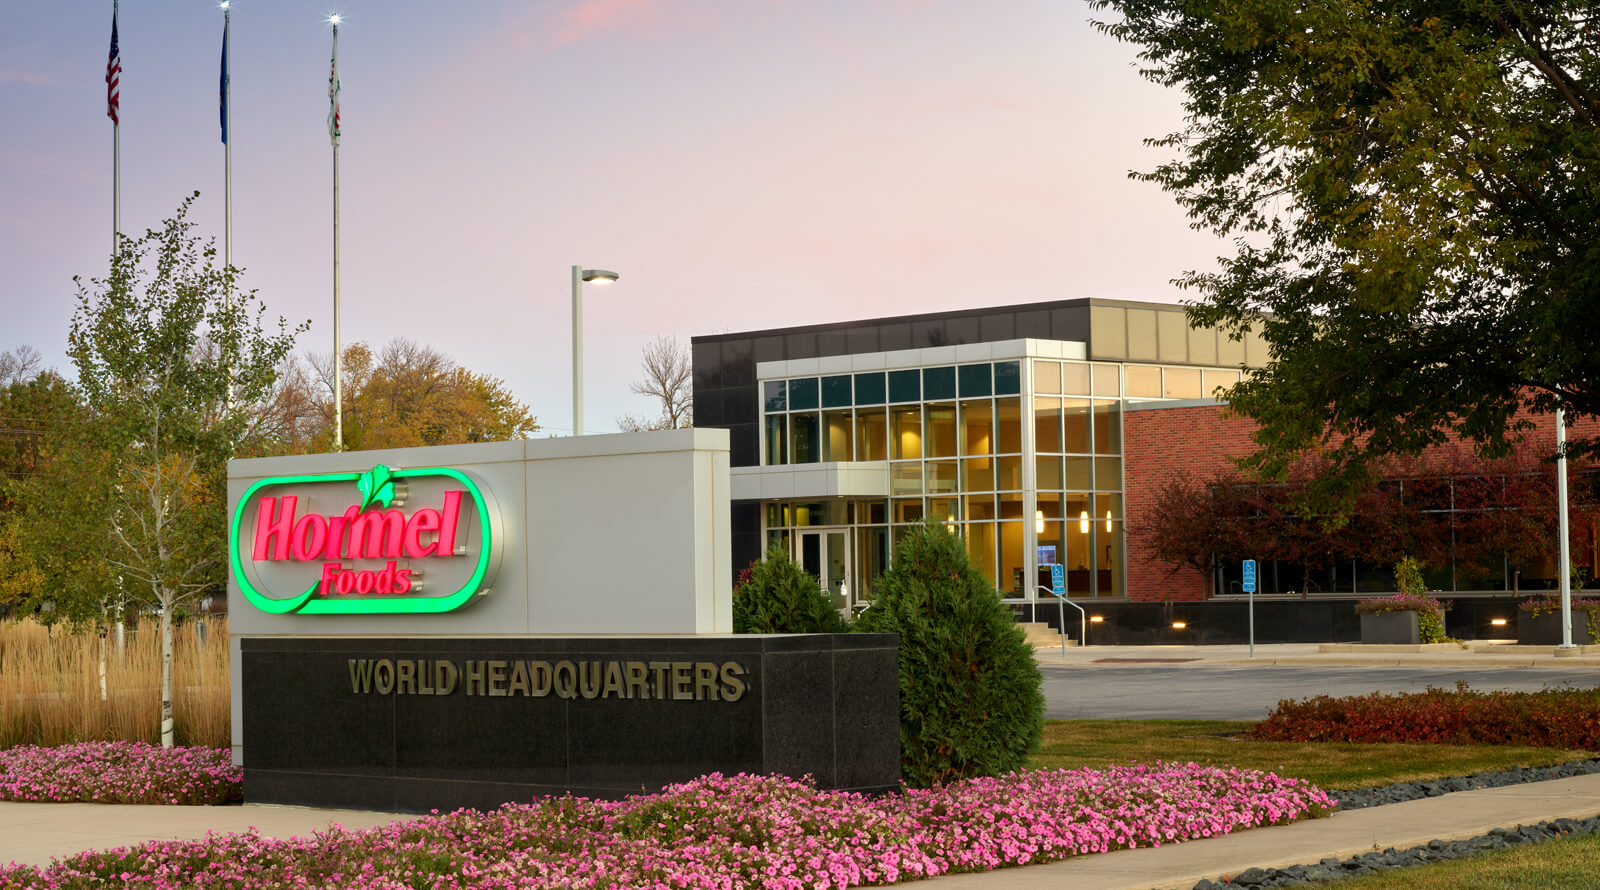 an exterior shot of Hormel Foods HQ